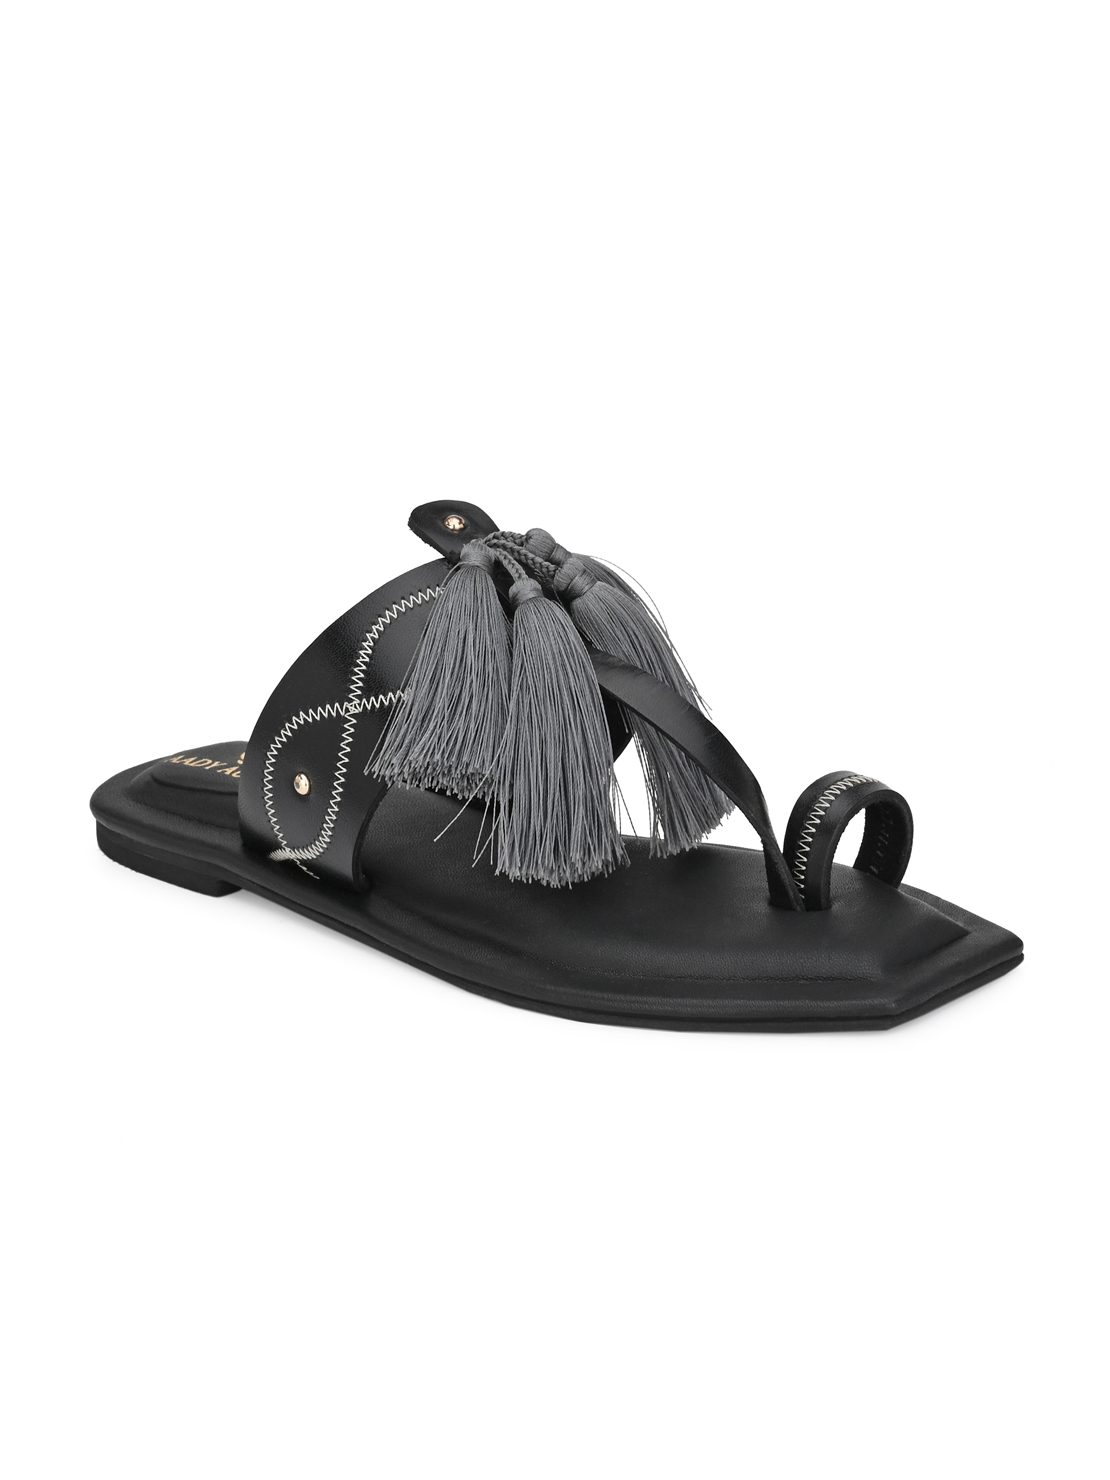 AADY AUSTIN   Aady Austin Women's Trendy Black Square Toe Flats